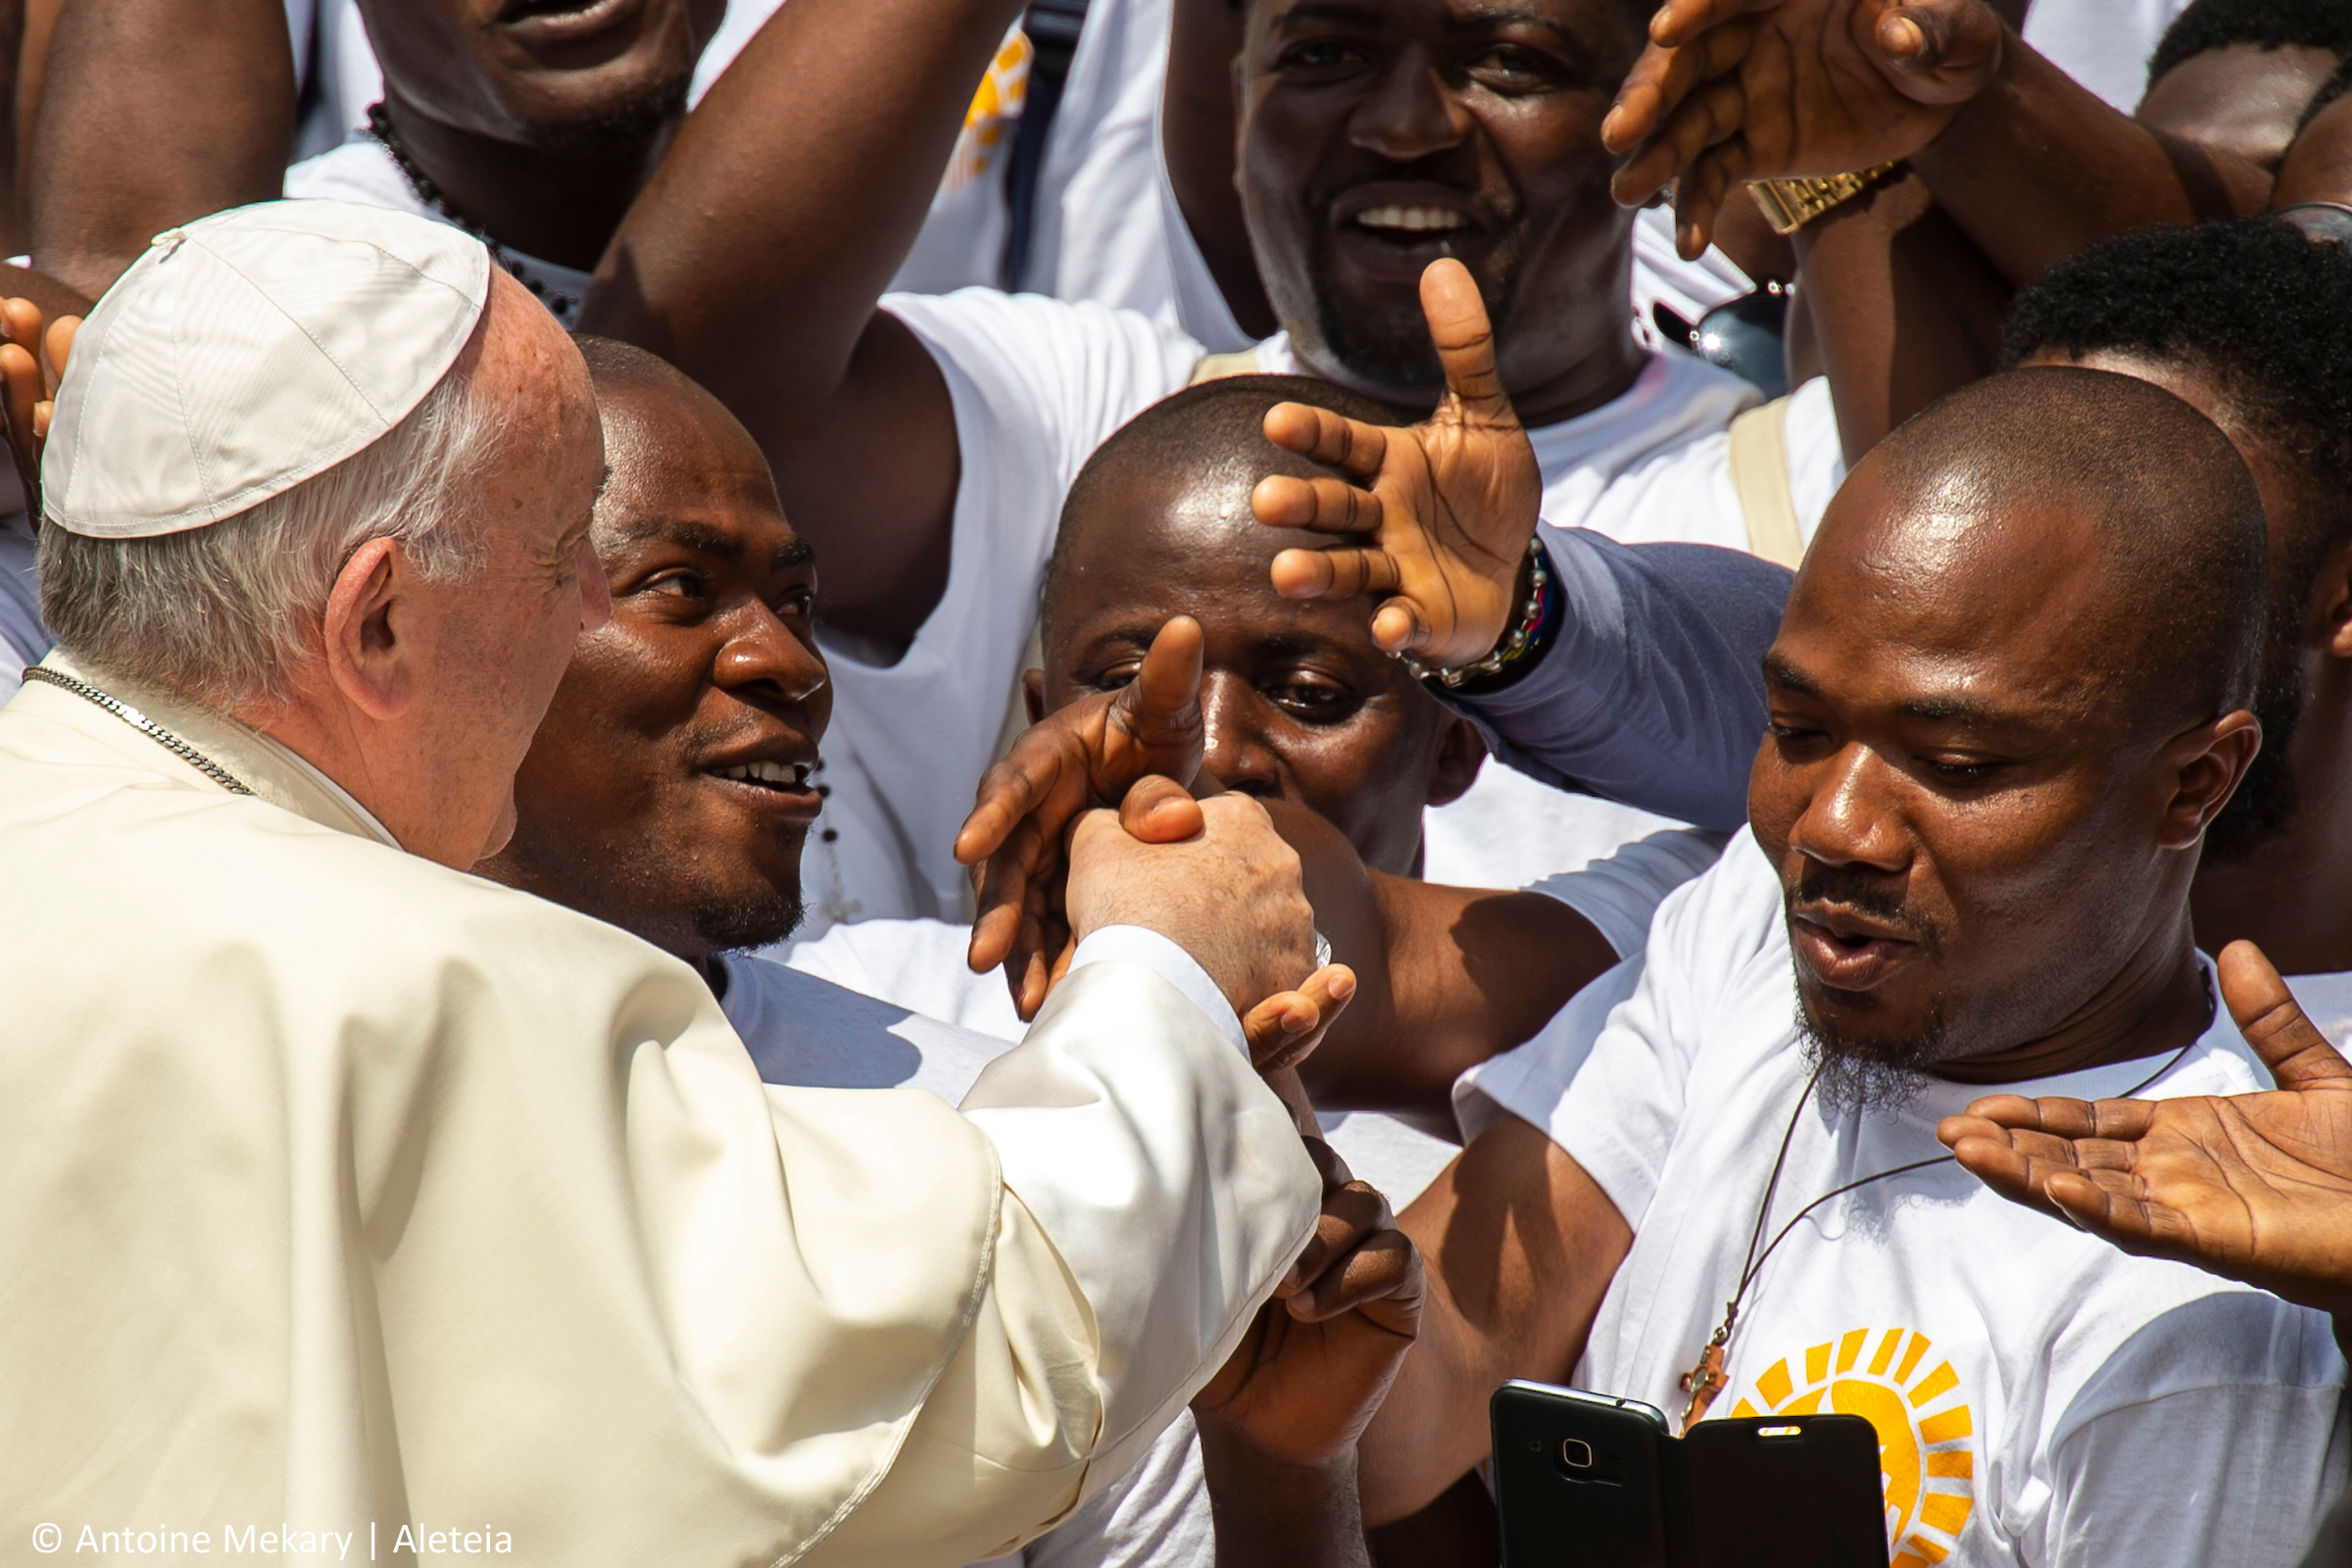 POPE FRANCIS,MIGRANTS